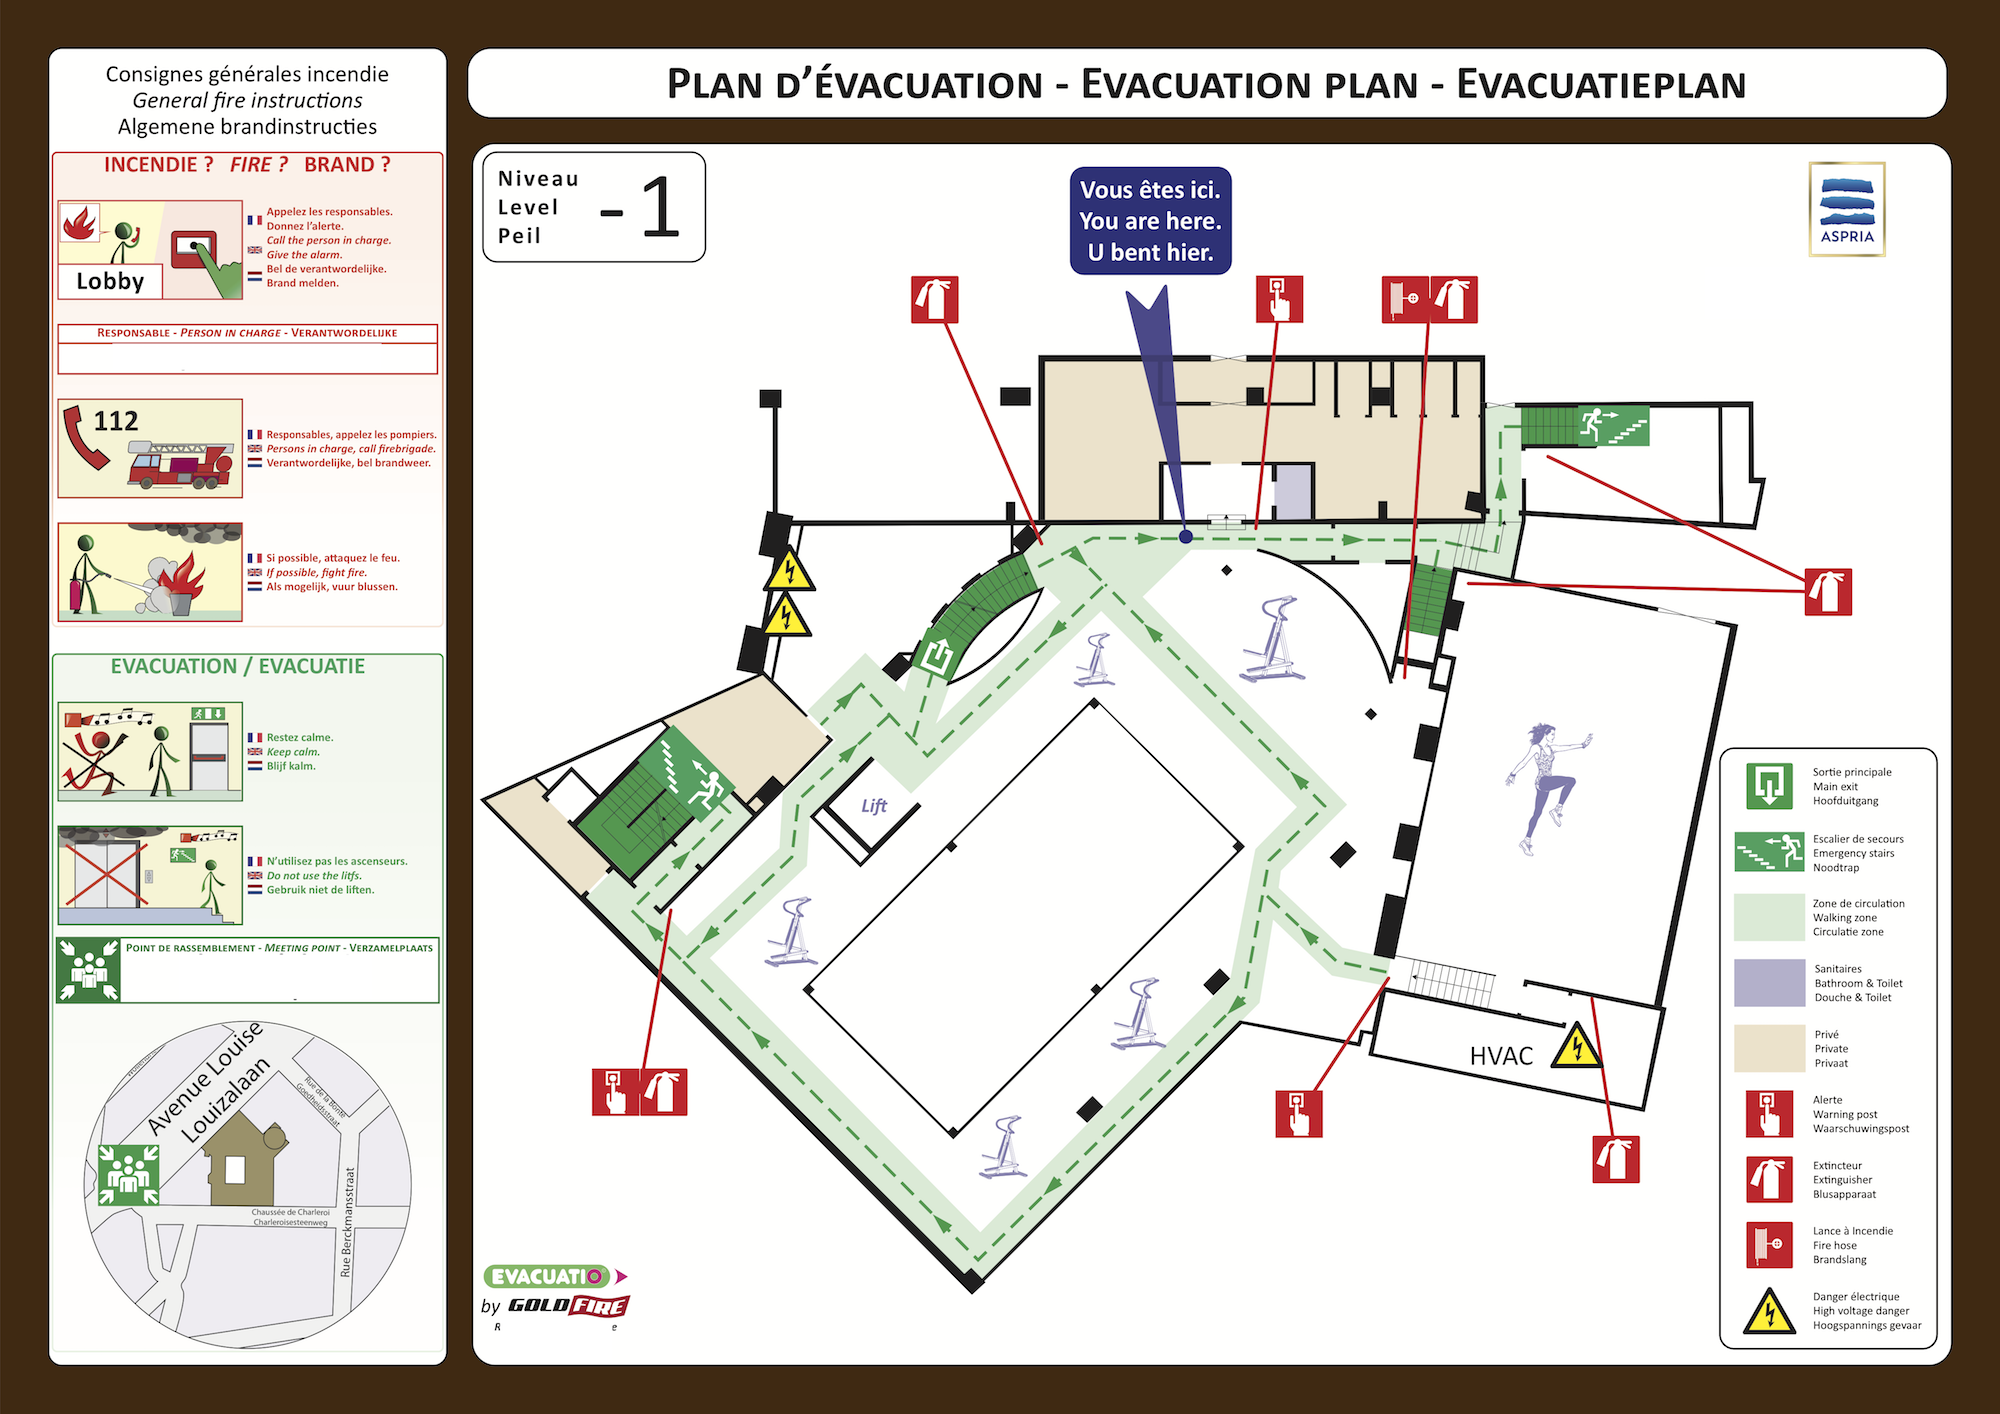 evacuatio evacuation plan. Black Bedroom Furniture Sets. Home Design Ideas